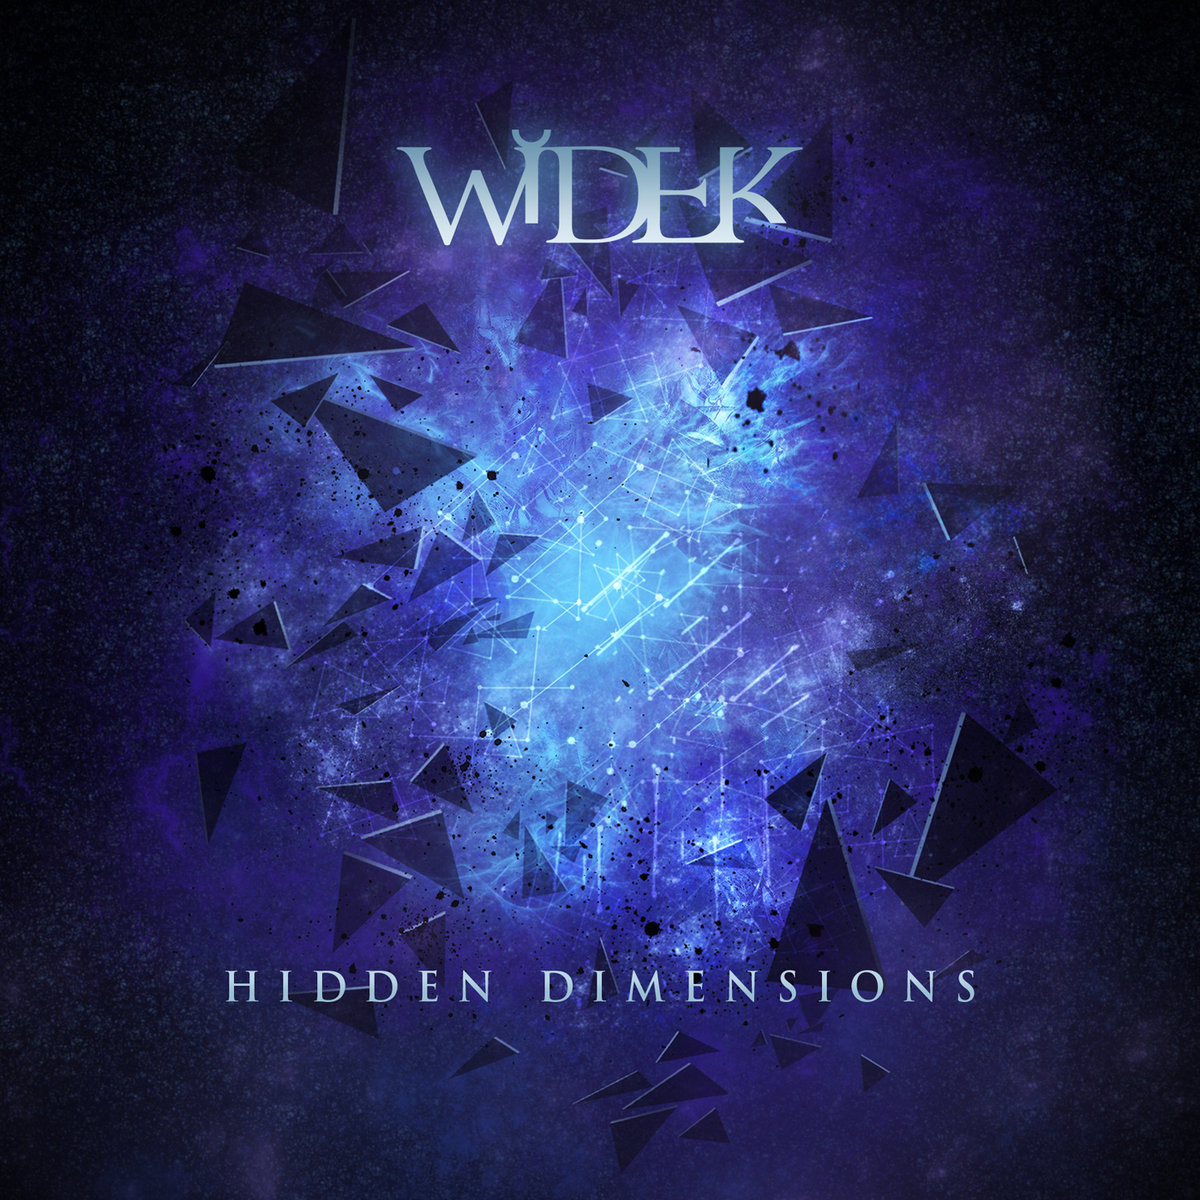 32. Widek - Hidden Dimensions